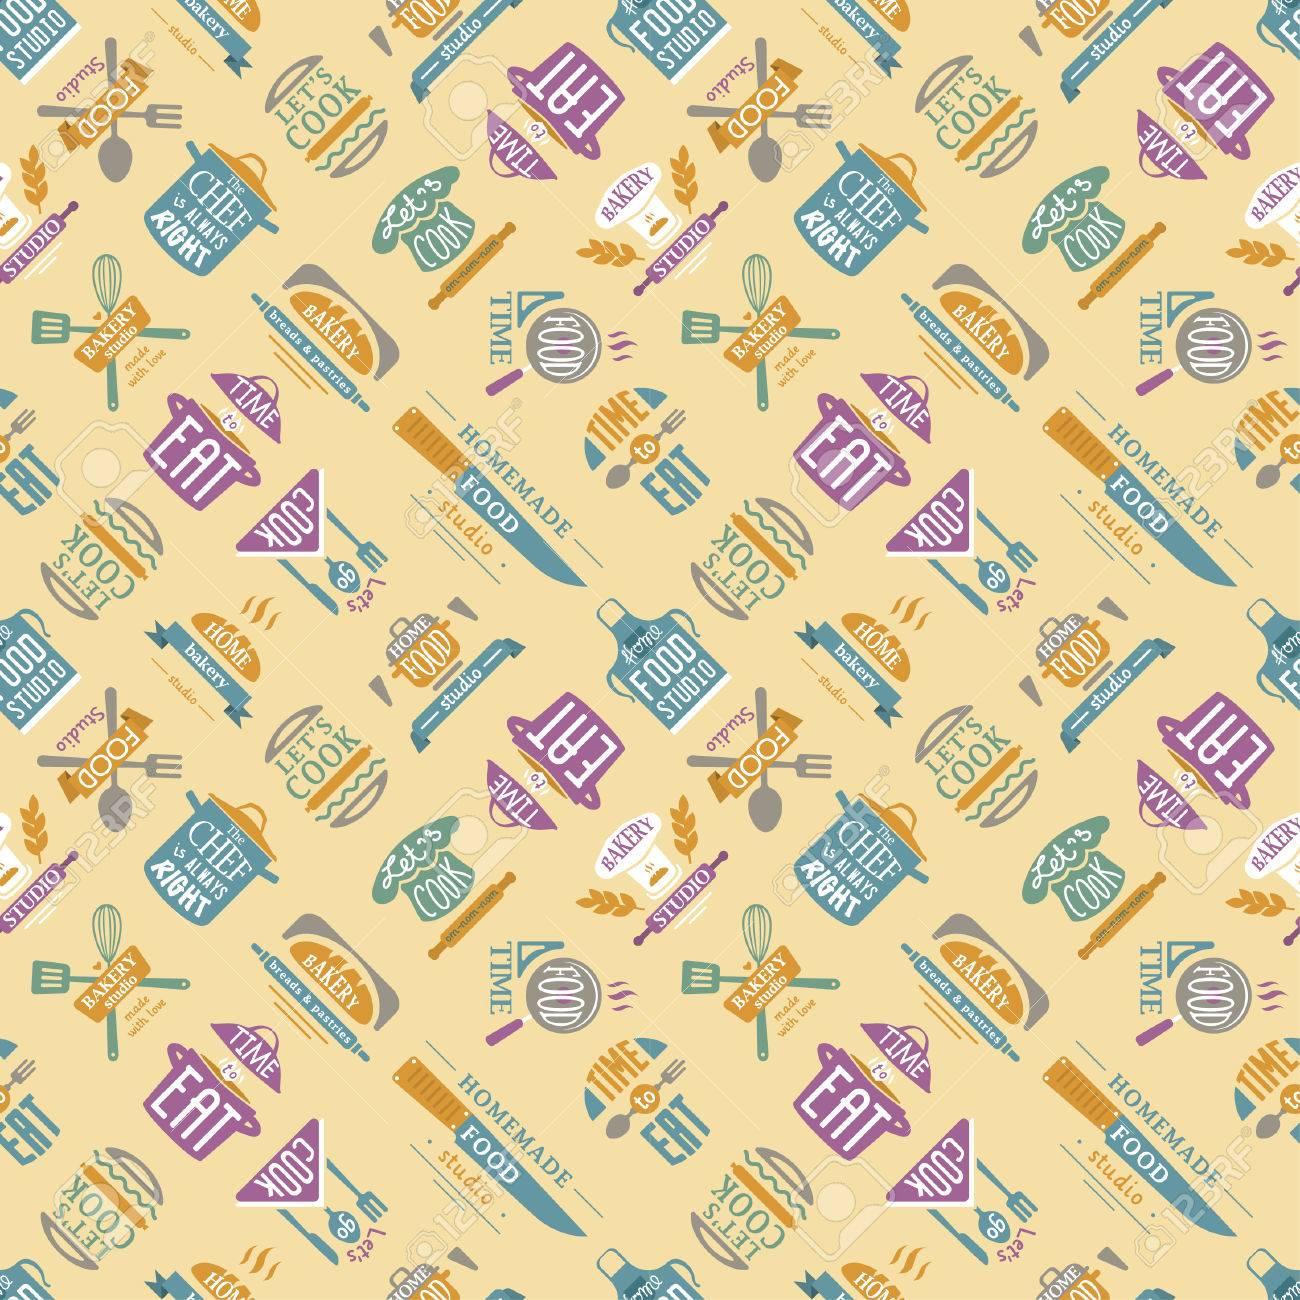 Cooking pattern illustration. - 69017543